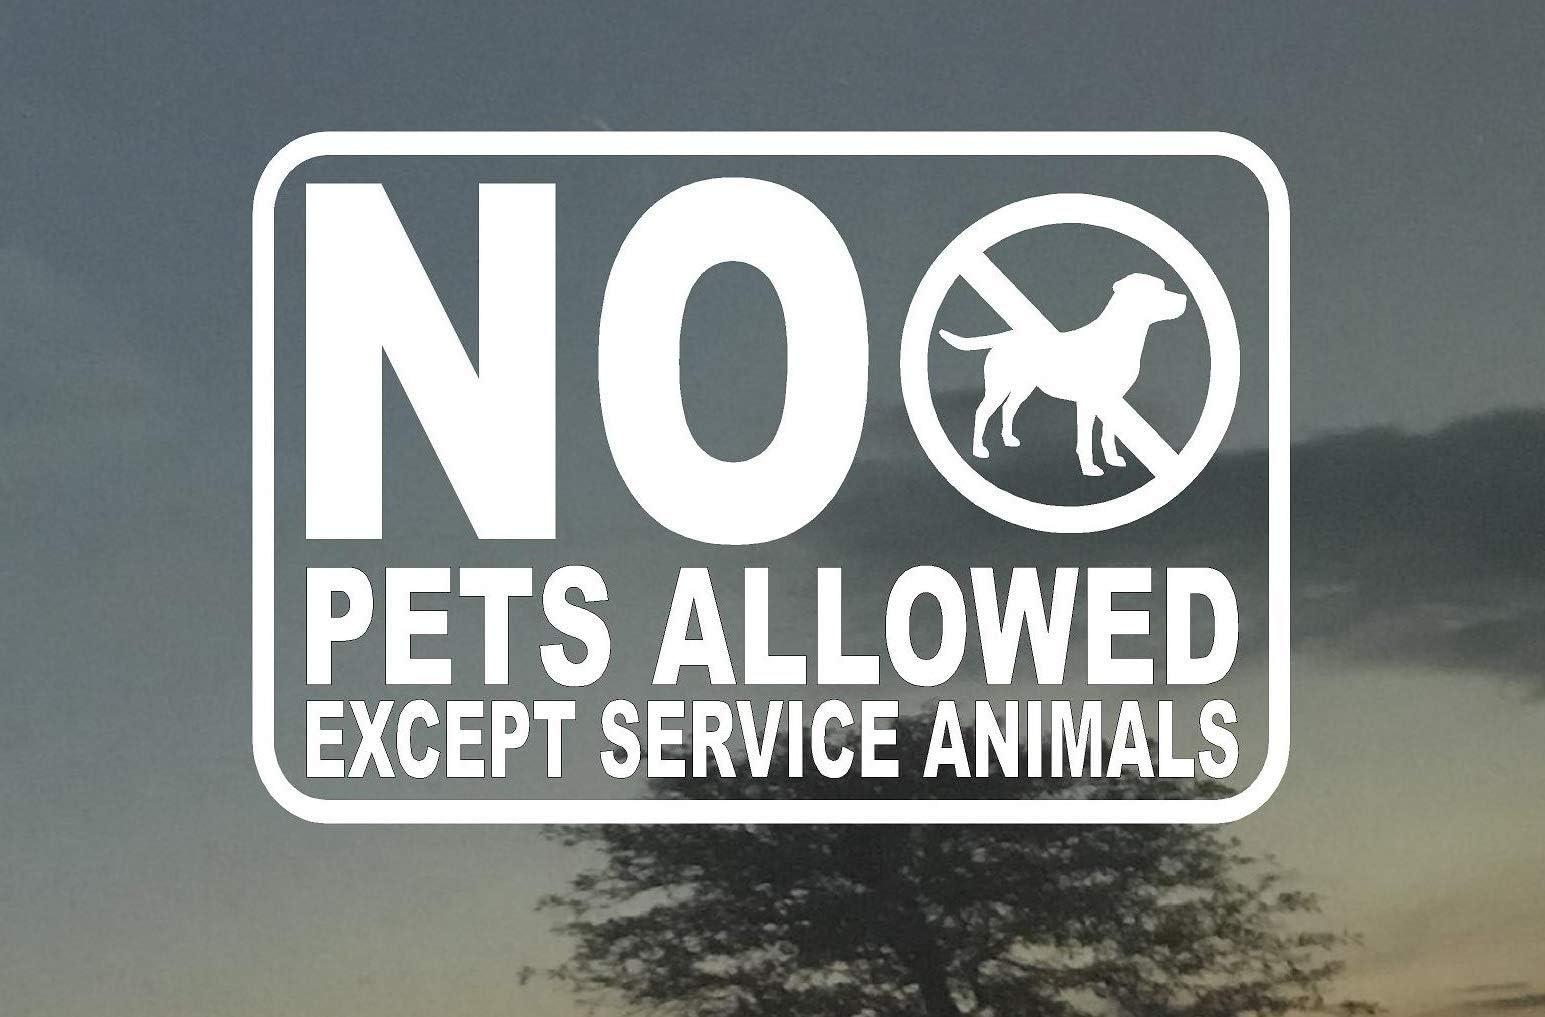 NO PETS ALLOWED Vinyl Decal Sign Sticker Business Store or Office Window Door